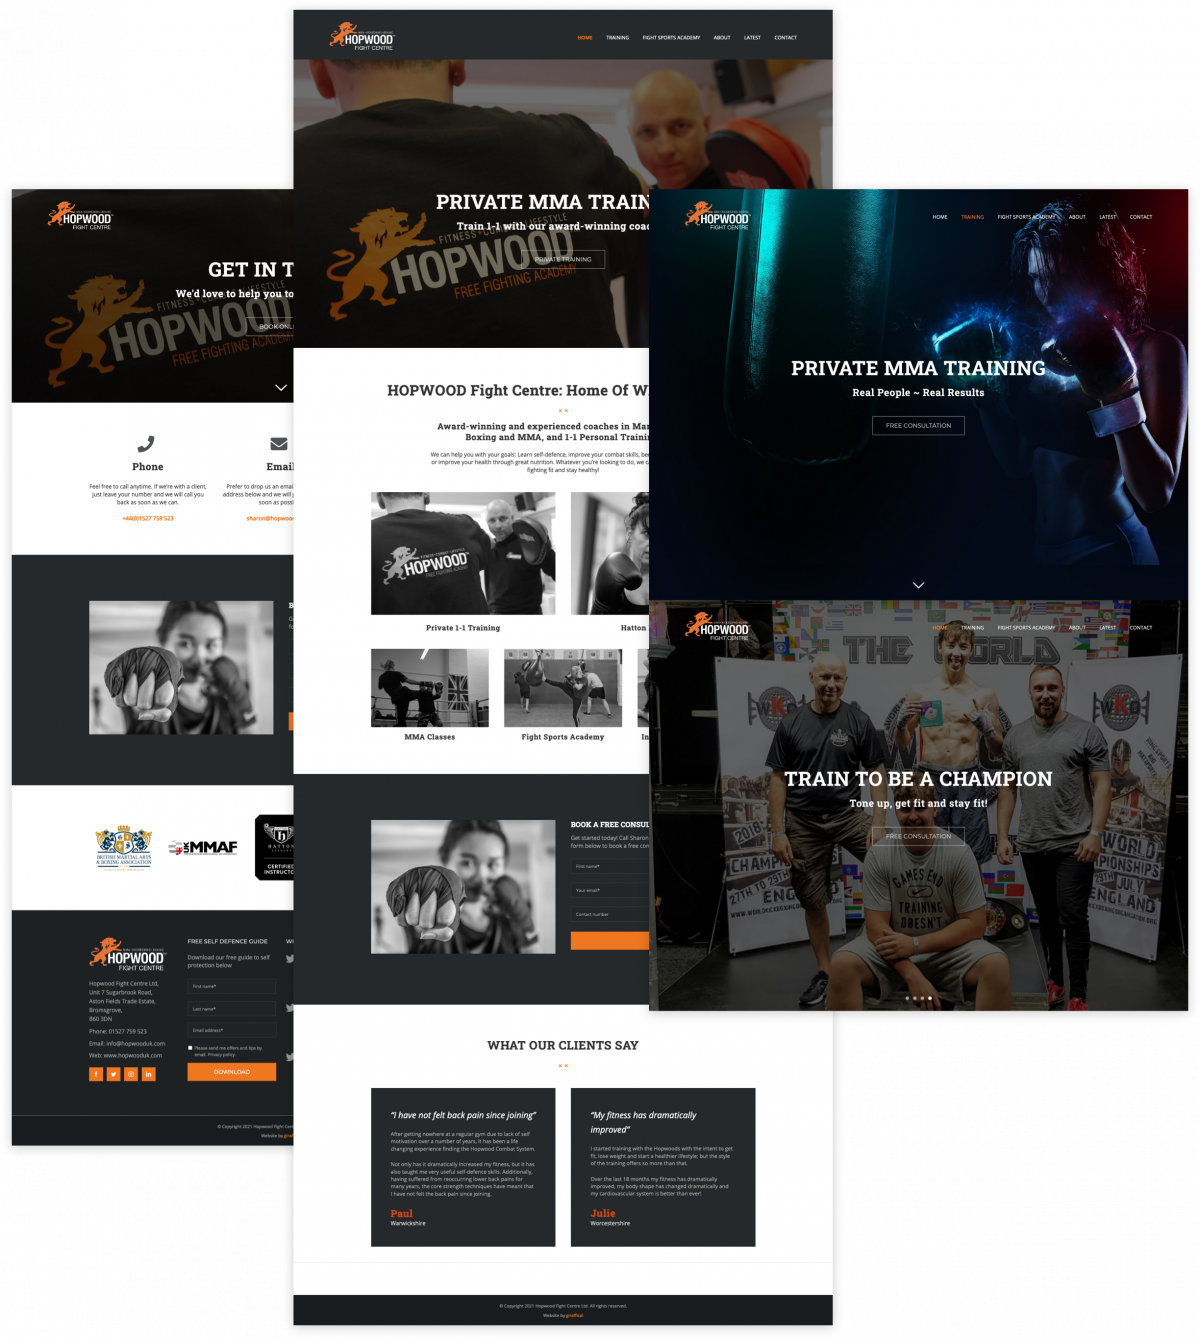 MMA Gym Website - Hopwood Fight Centre